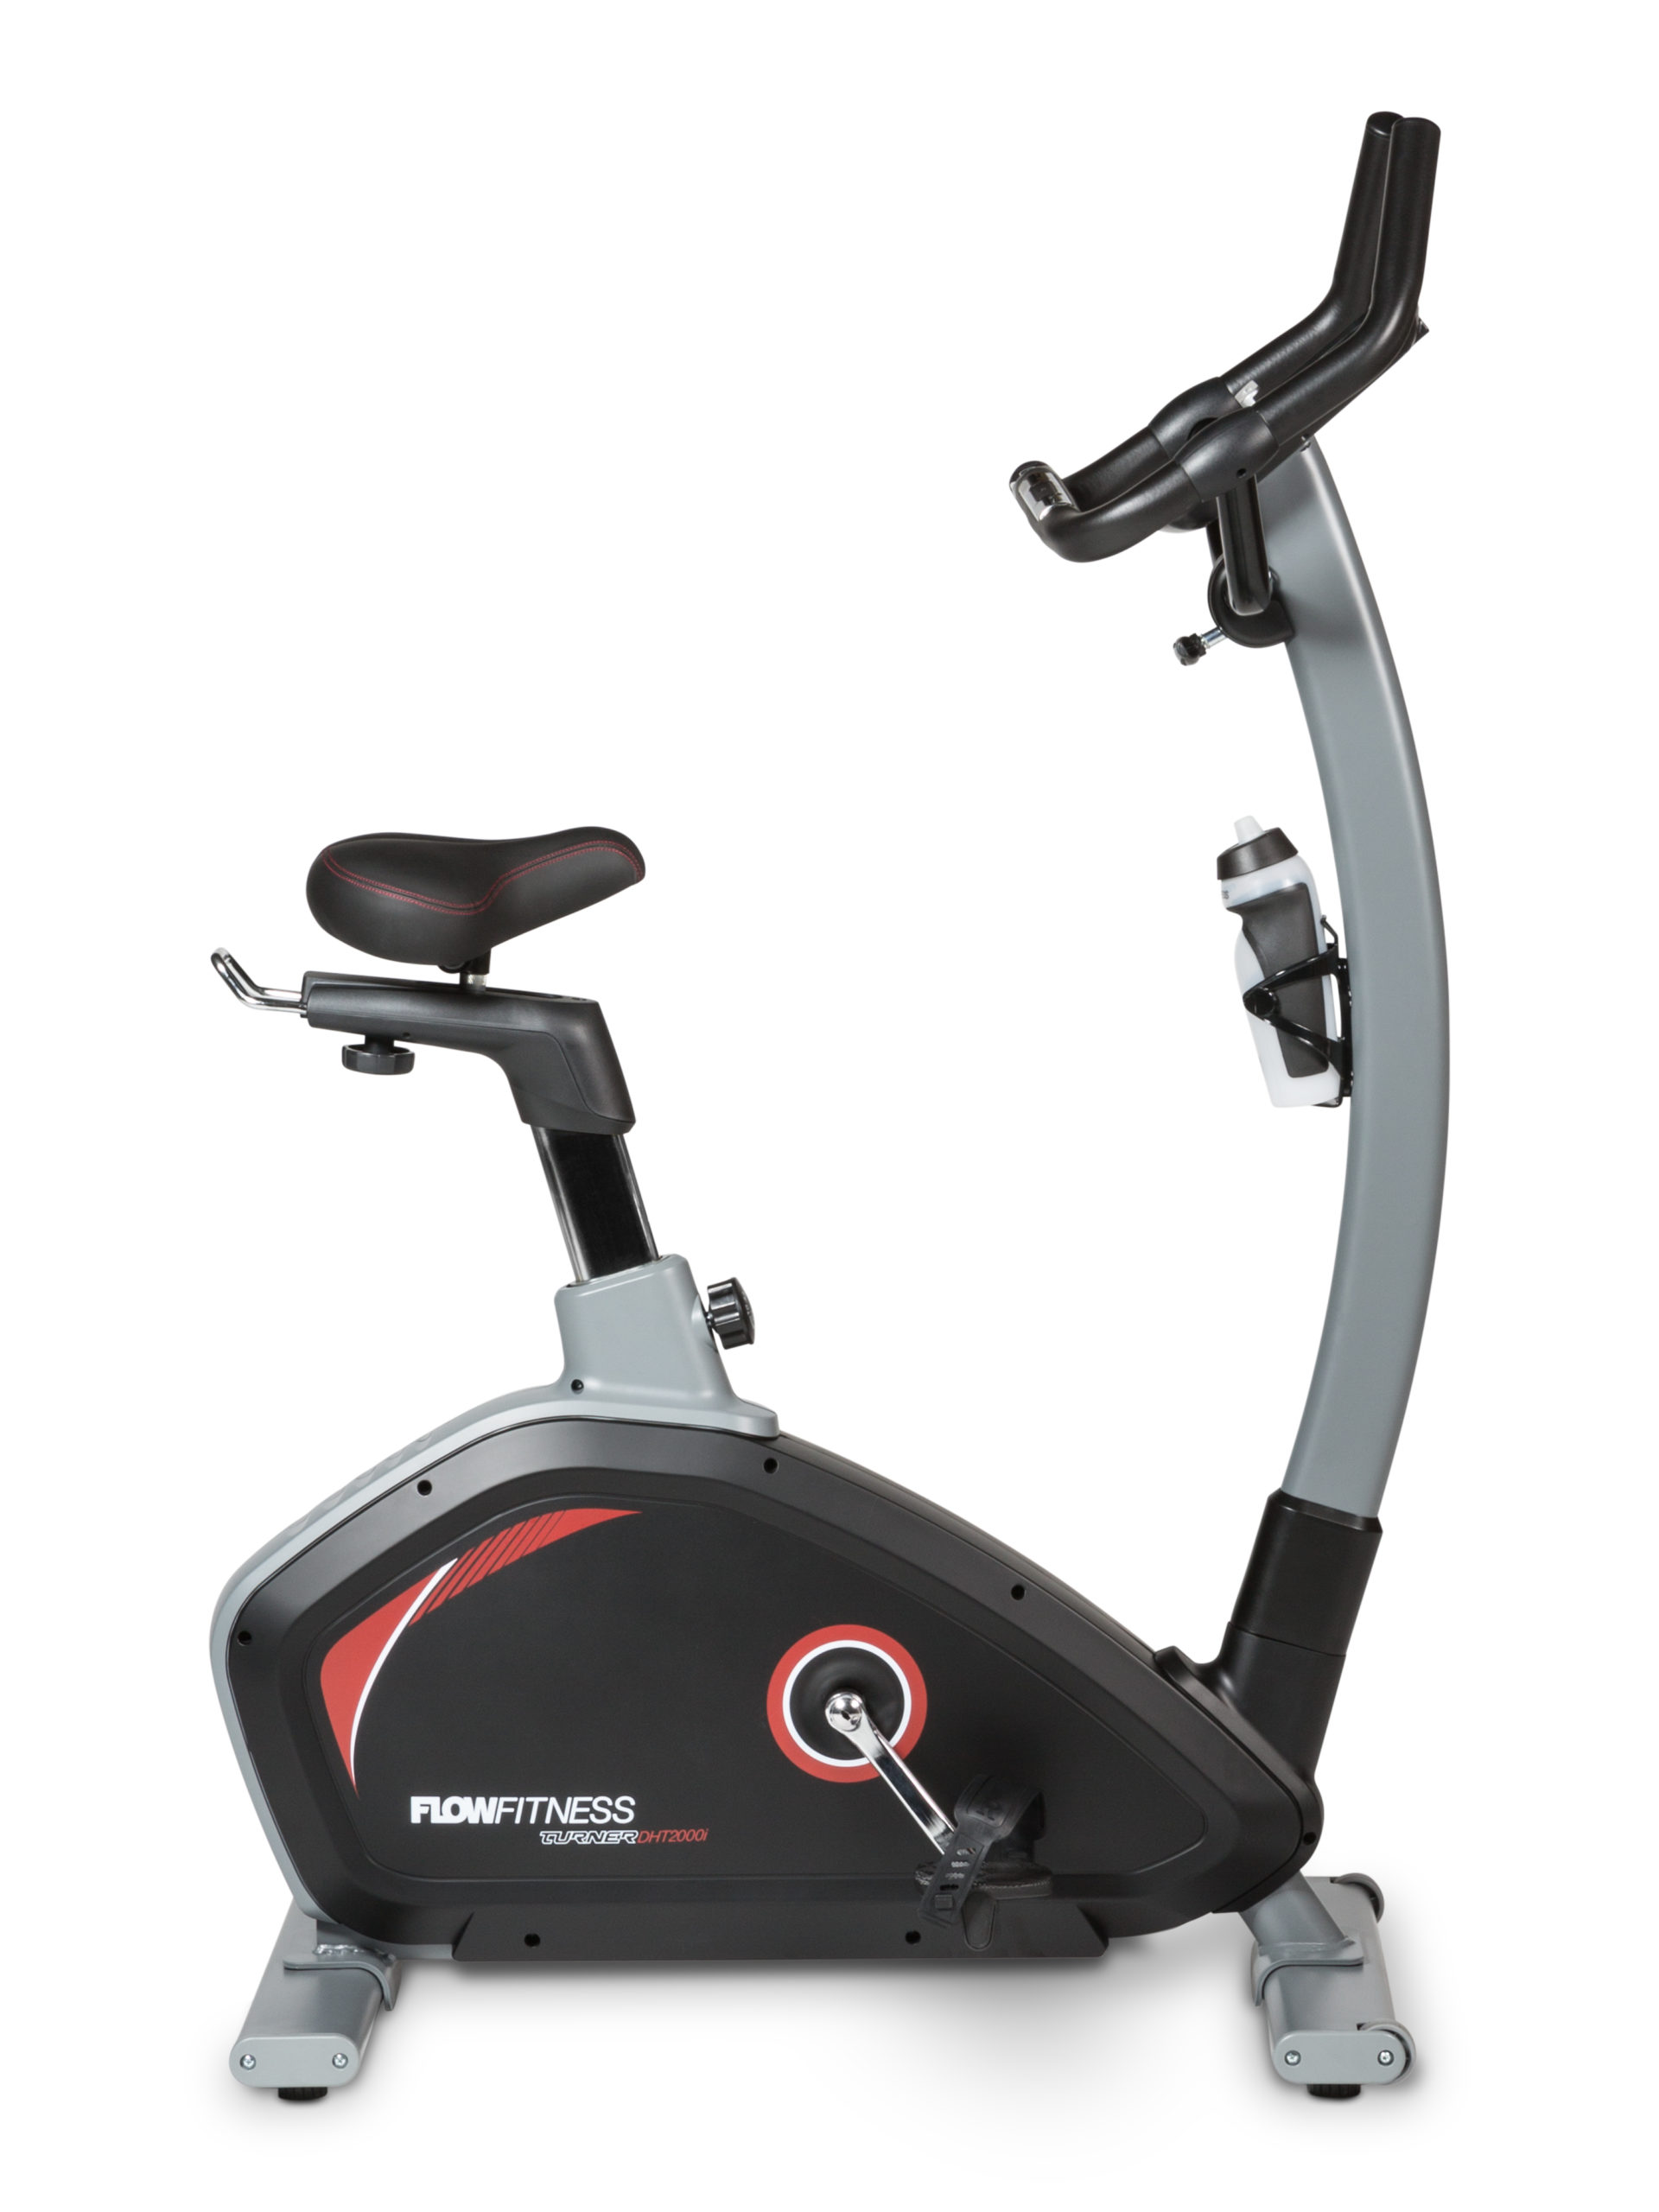 Flow Fitness Tabel Turner DHT2000i Hometrainer 16